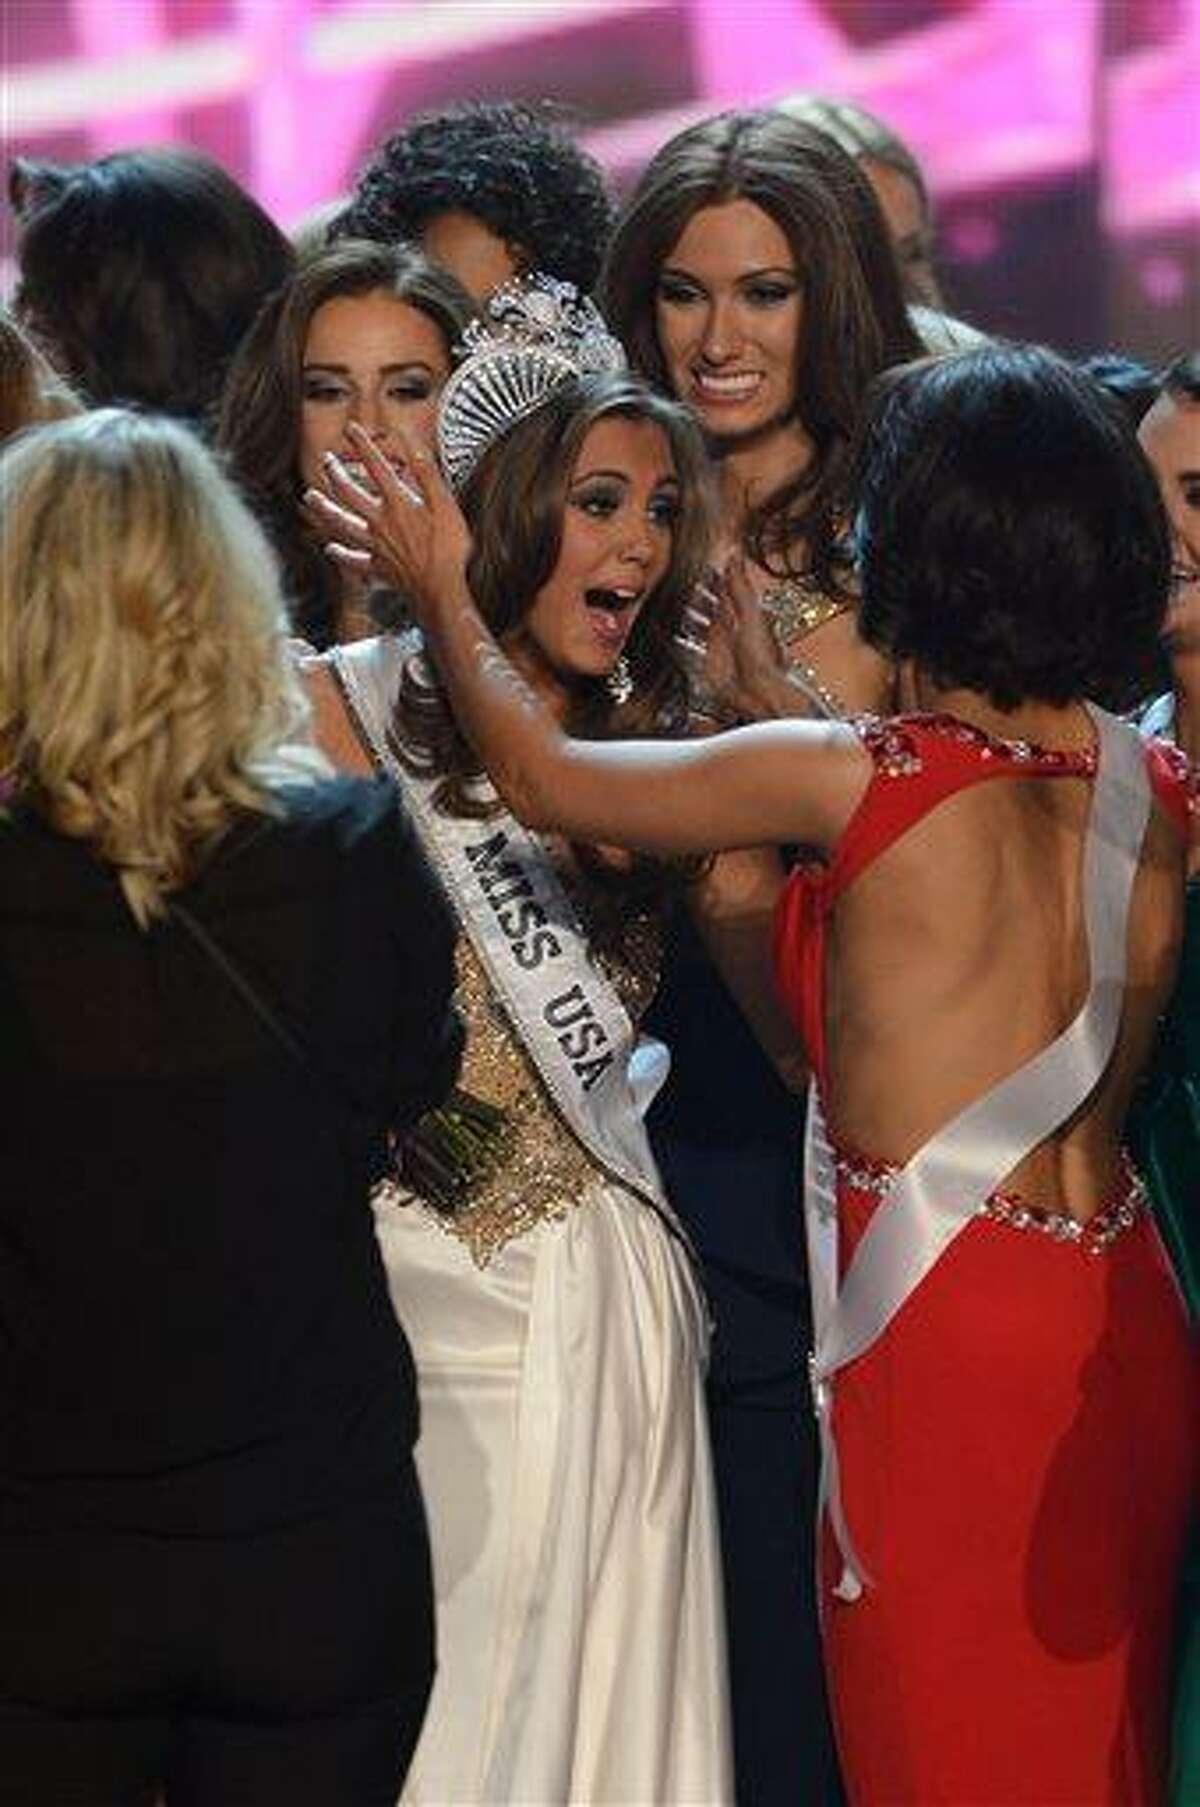 Miss Connecticut Erin Brady, center, reacts after winning the Miss USA 2013 pageant, Sunday, June 16, 2013, in Las Vegas. (AP Photo/Jeff Bottari)